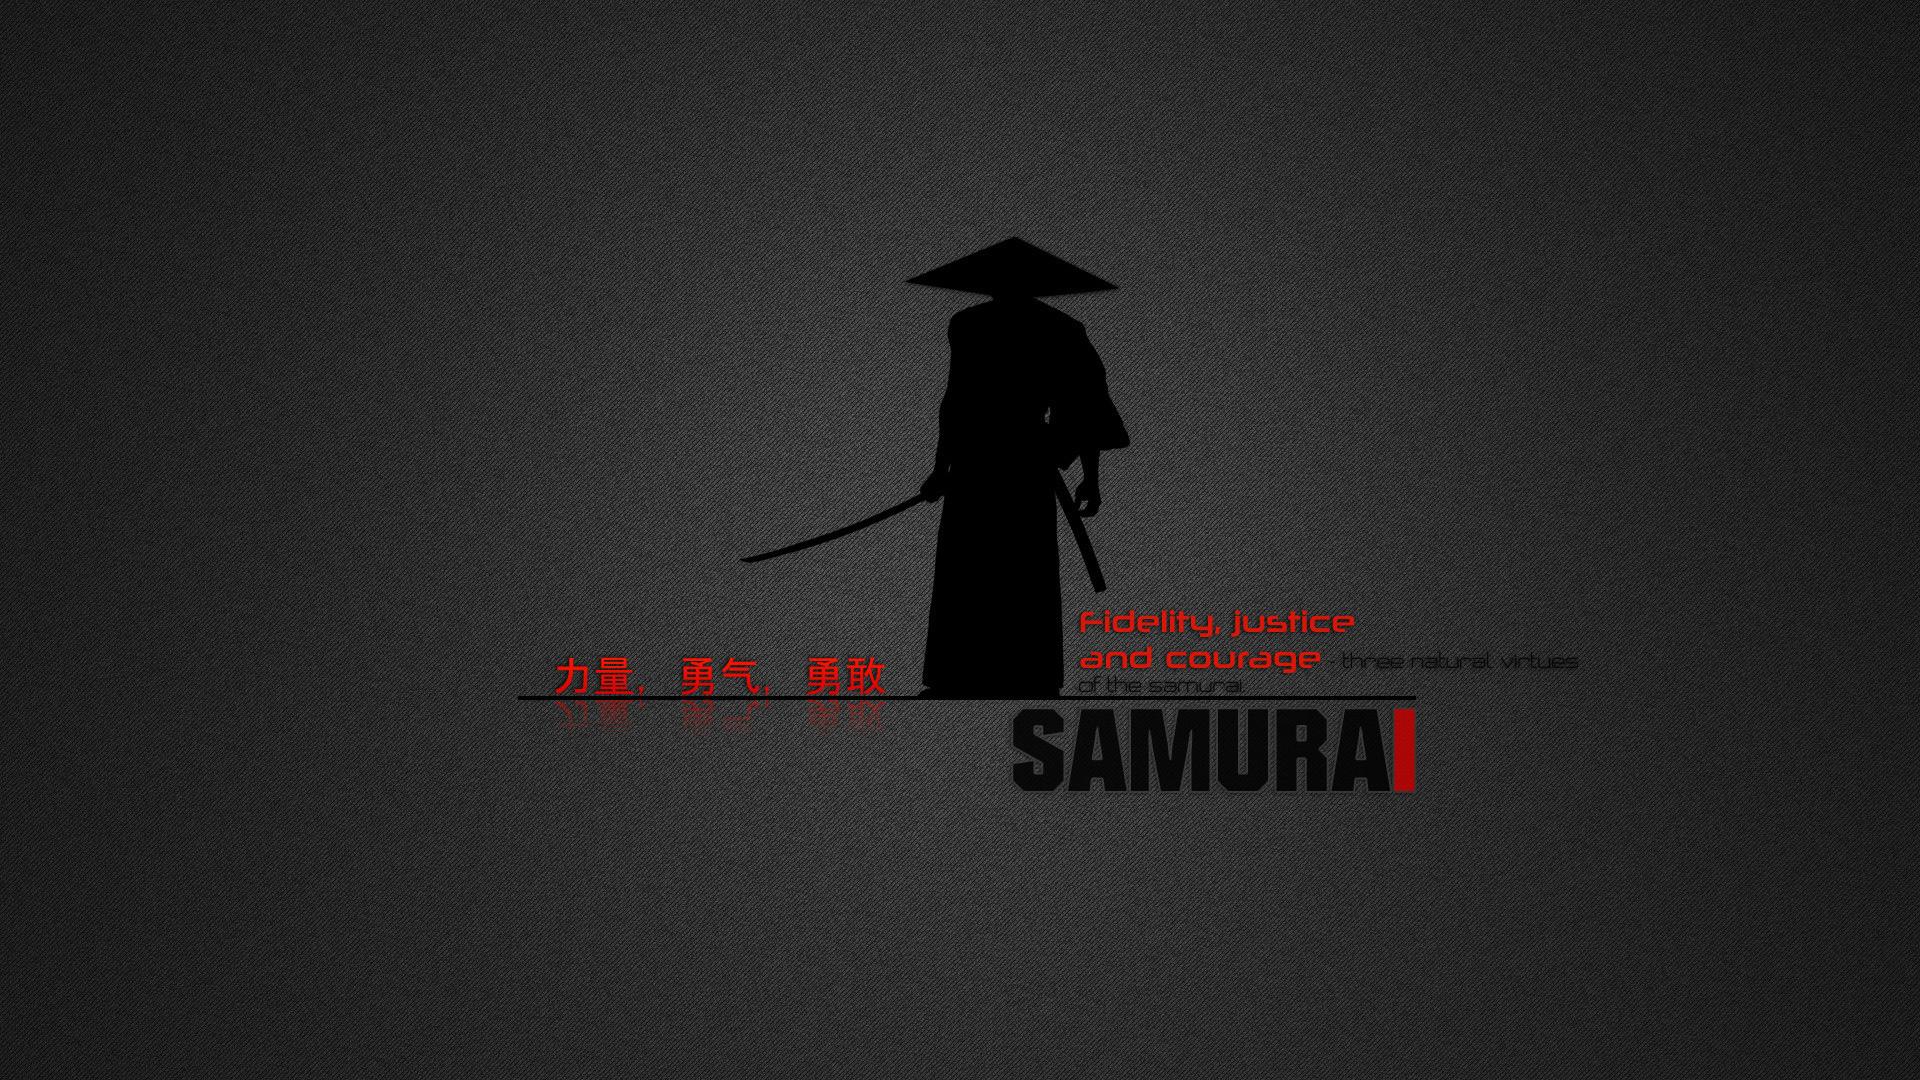 Hd Samurai Wallpaper Bushido Samurai Wallpaper